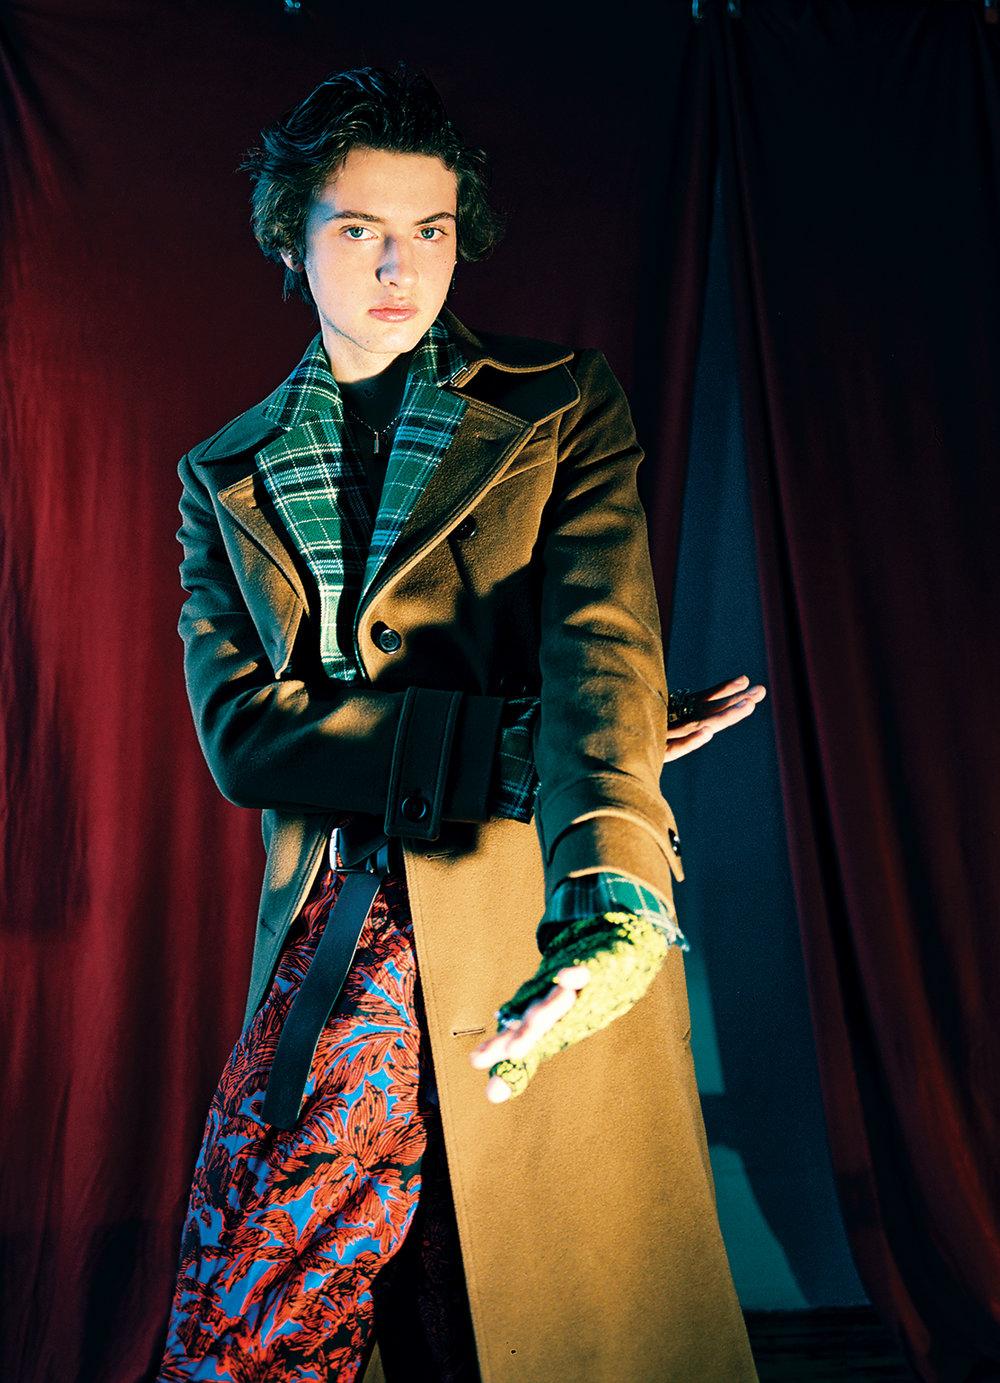 Jacket  GUCCI  Coat and Gloves  DIOR HOMME  Trousers  3.1 Phillip Lim  Shoes  Ermenegildo Zegna